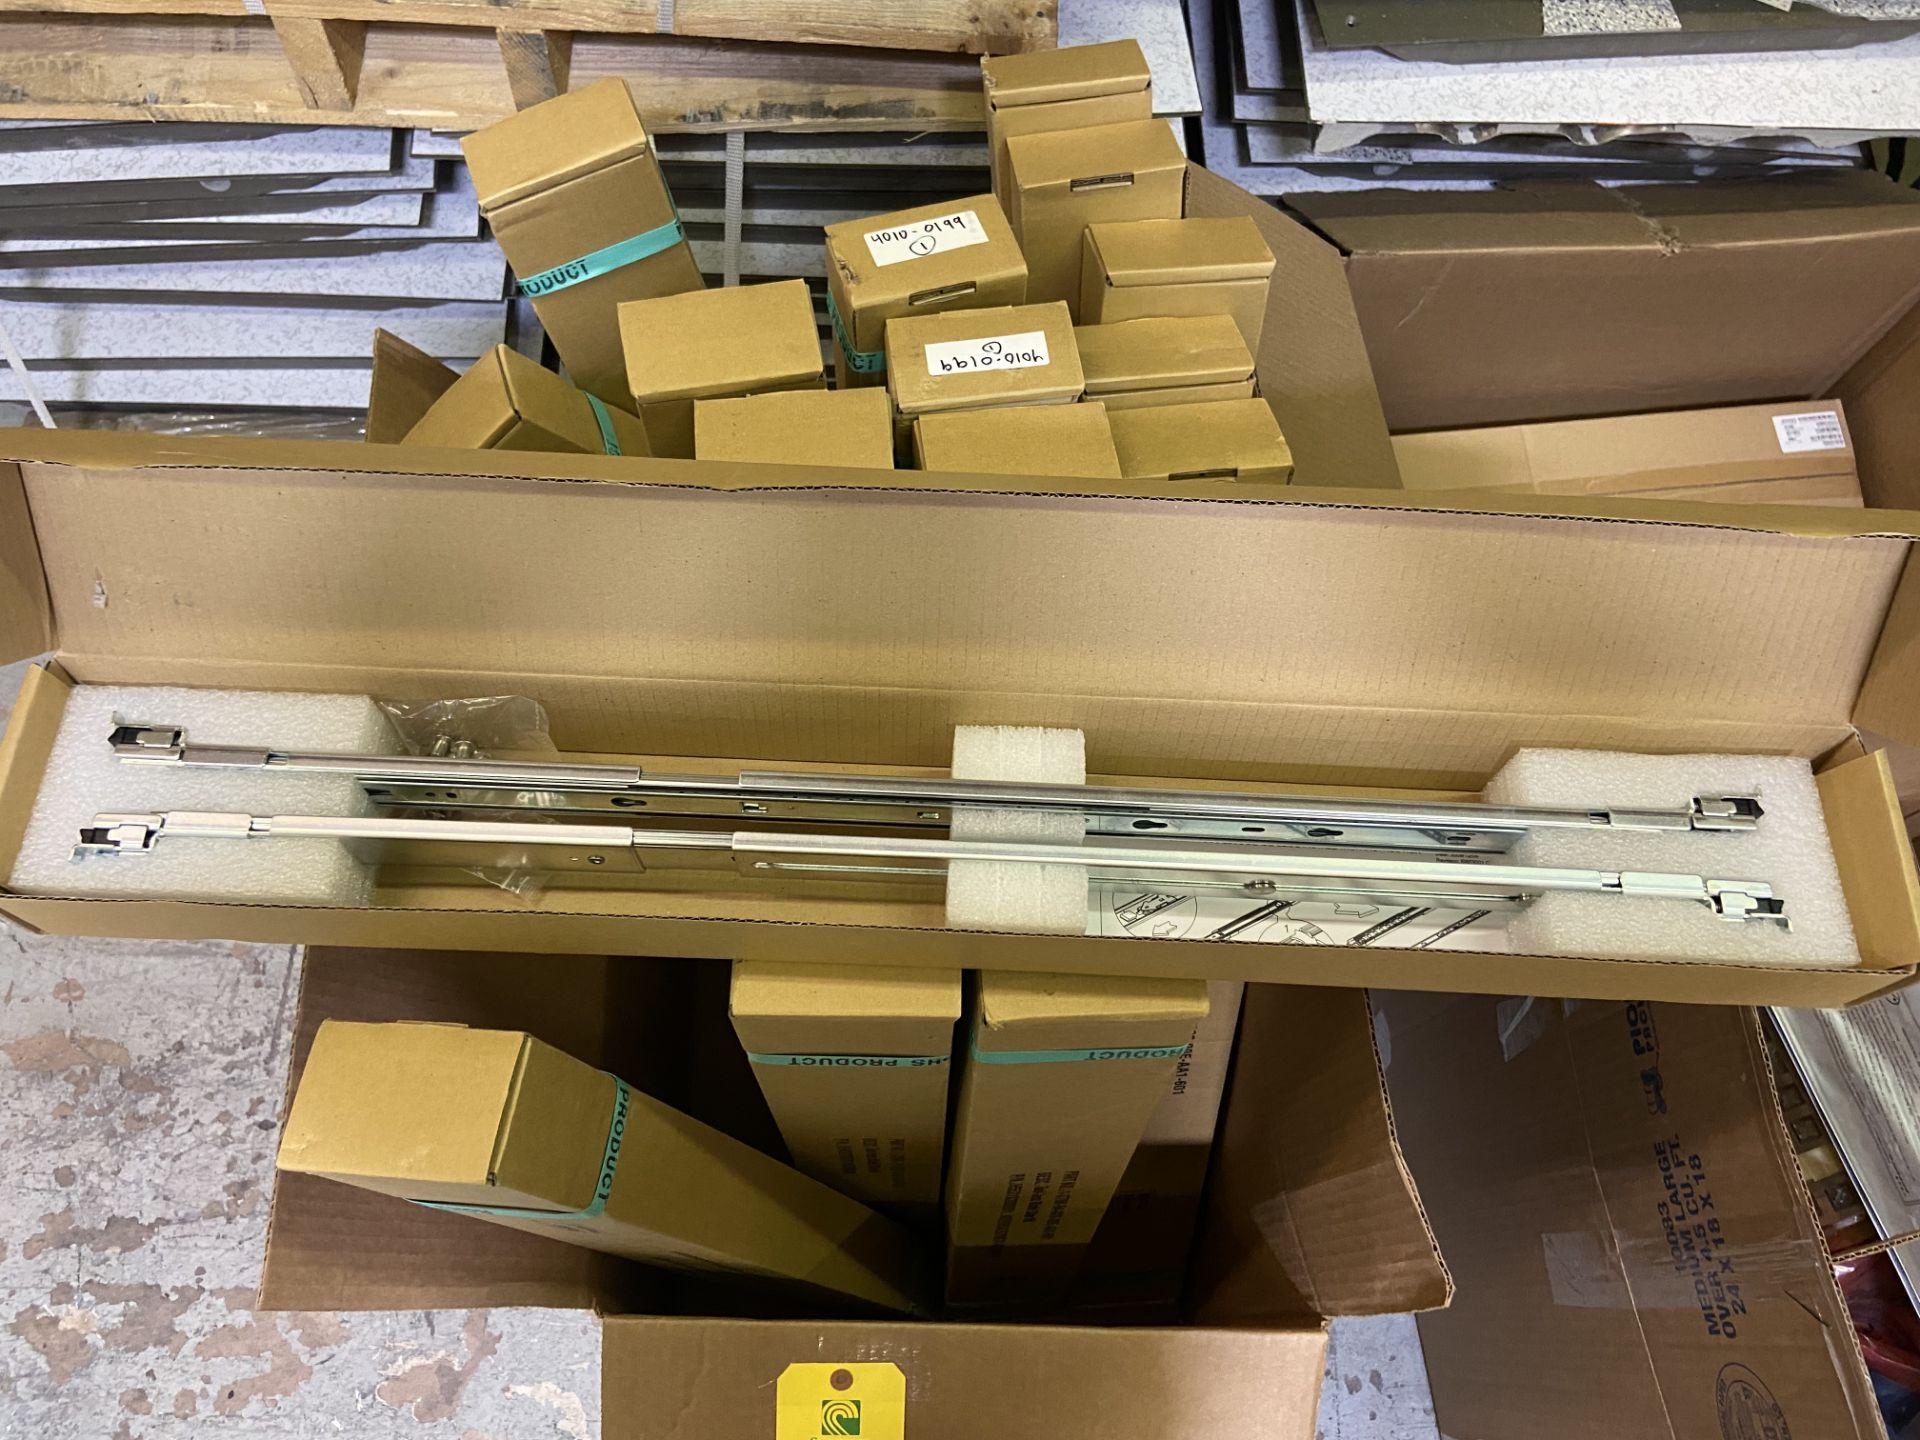 Tool-Less Blade Slide Kit, Qty 23, Part# 1-3700-94-026-00E-AA1-601, Rigging Fee: $25